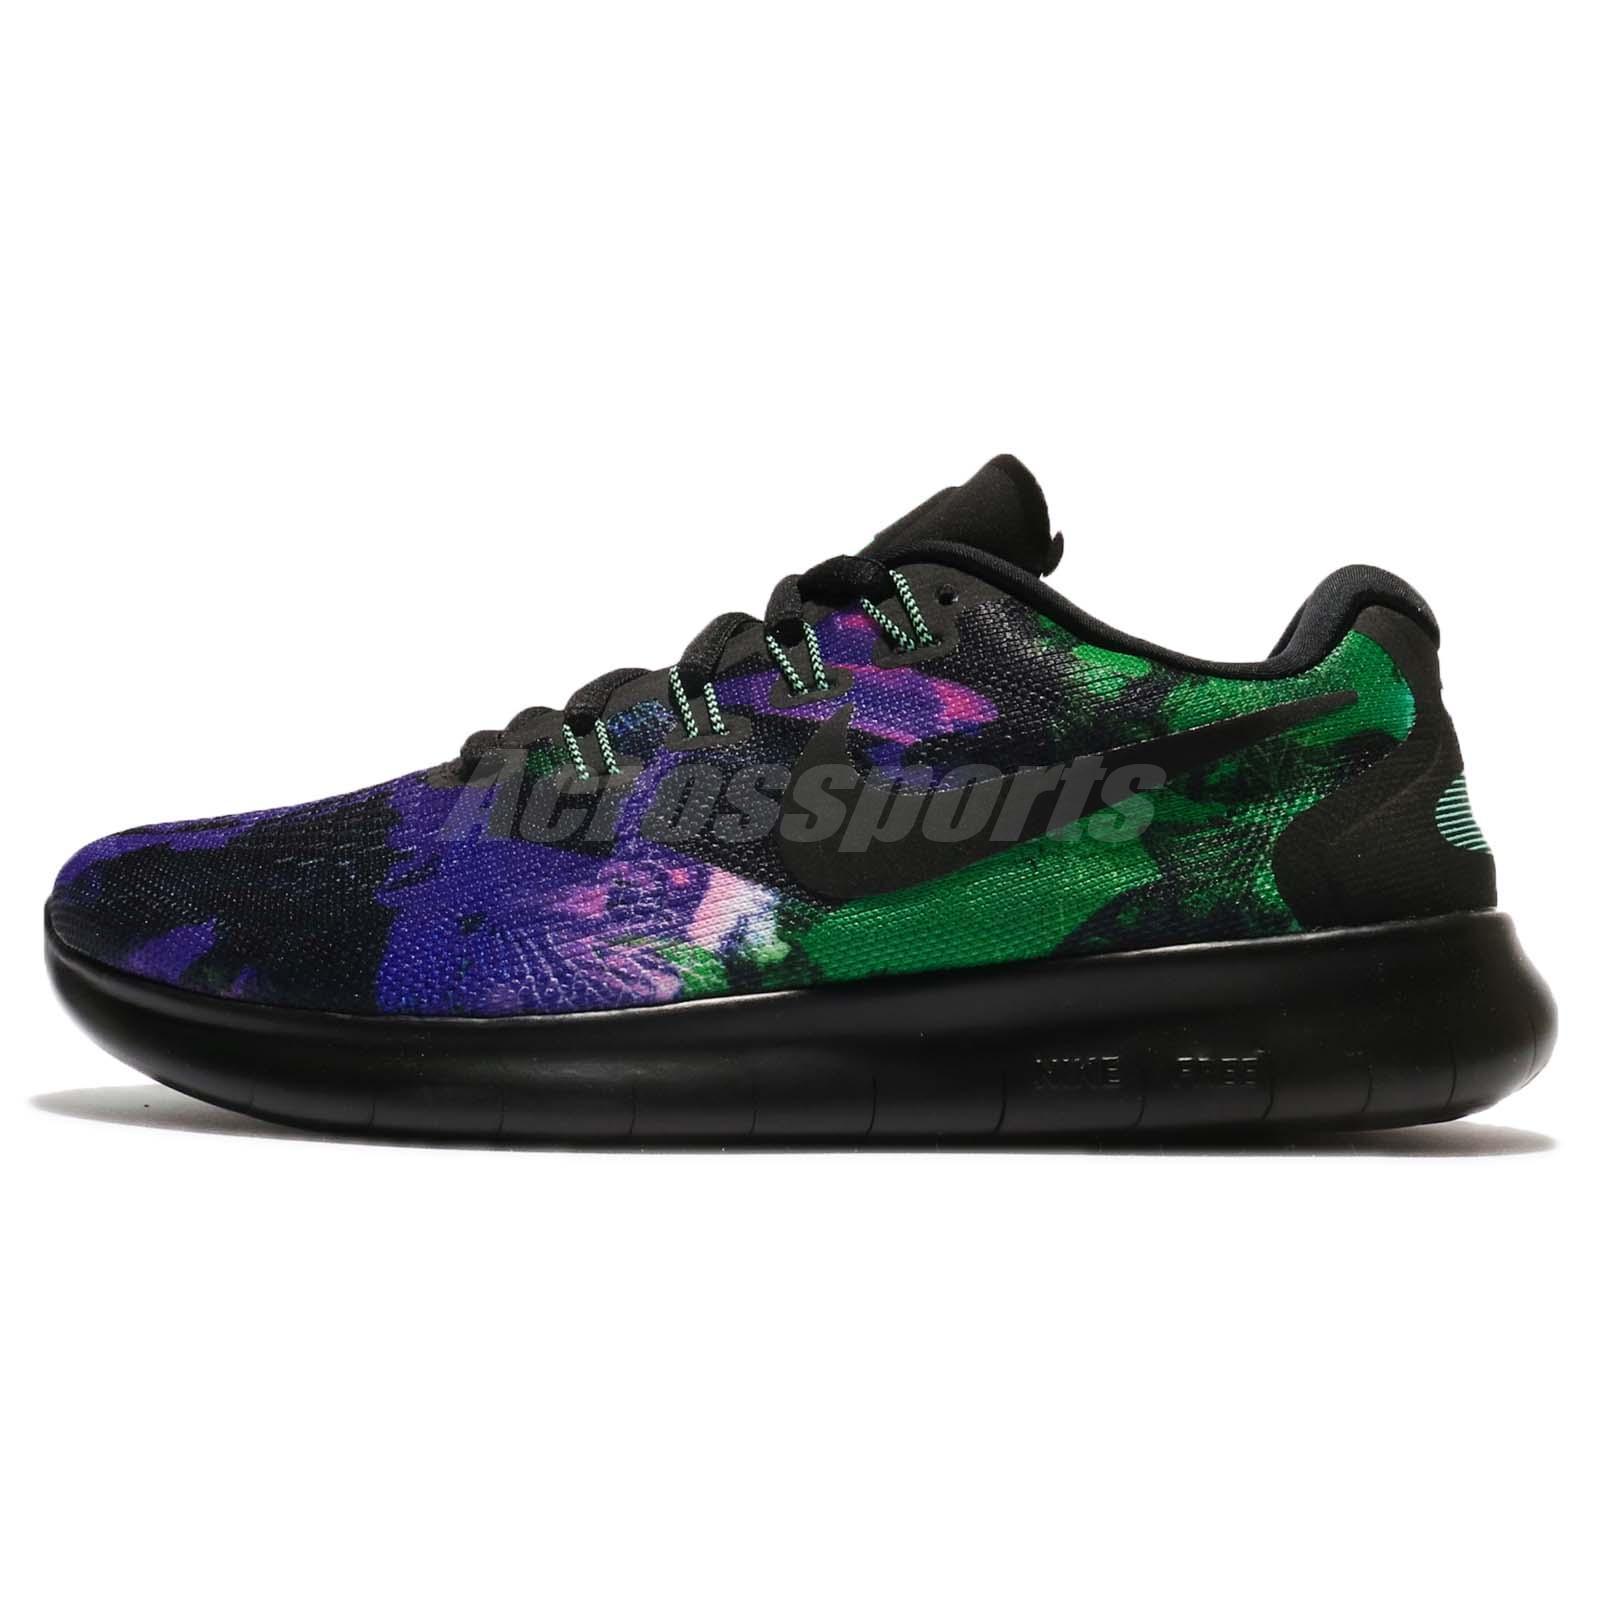 Wmns Nike Free RN 2017 Solstice Run Purple Green Women Running Shoes  883295-001